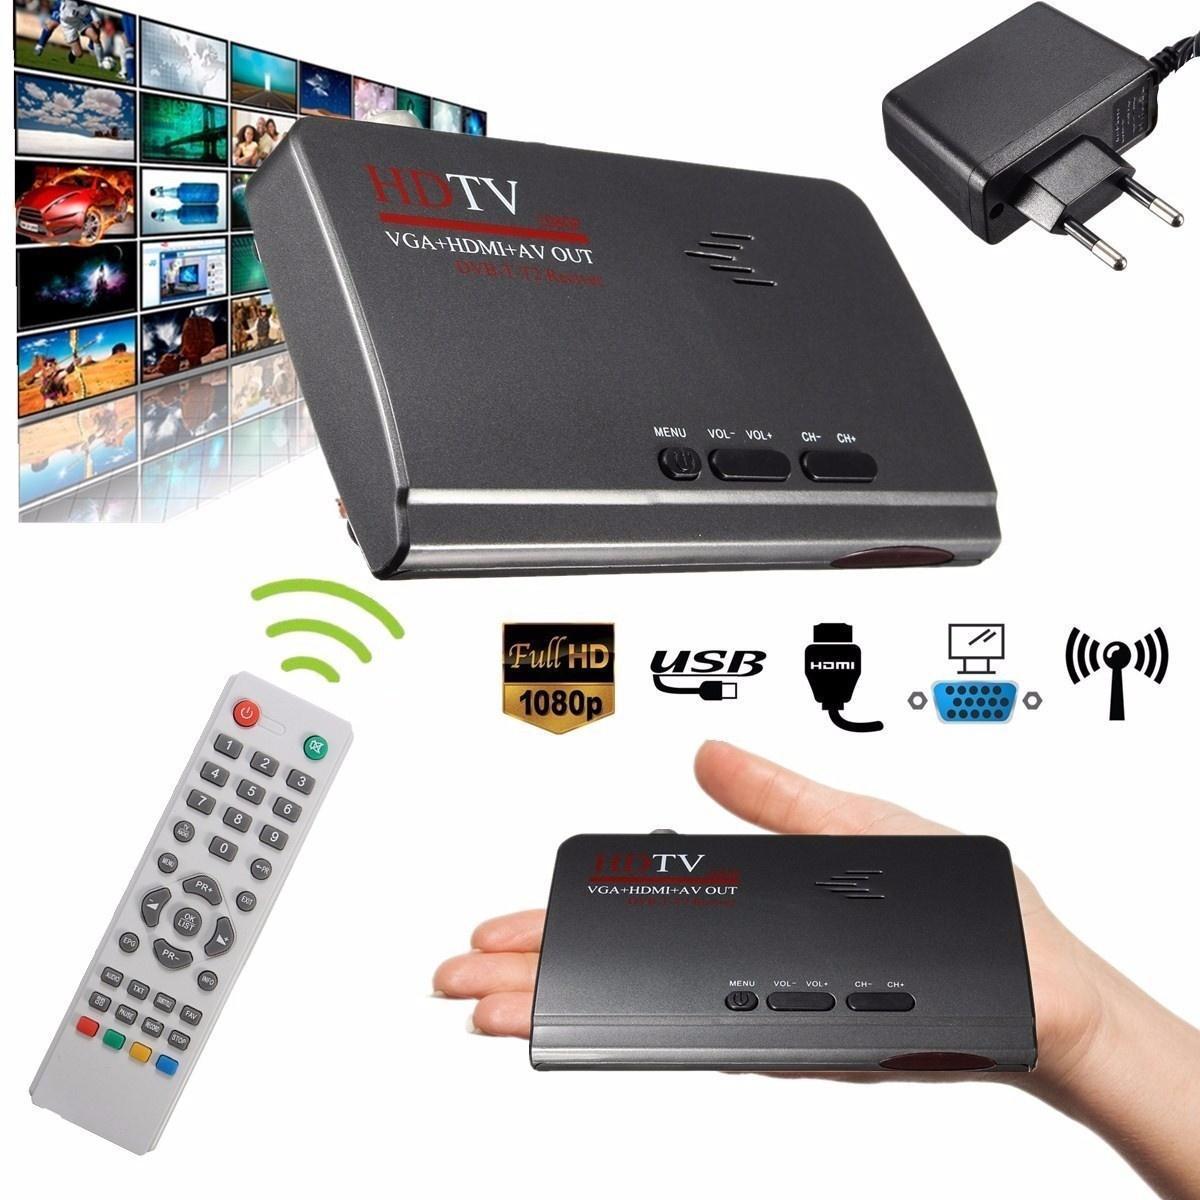 1080P HDMI DVB-T-T2 TV Box VGA/AV тюнер приемника конвертер с дистанционным управлением original satlink ws 7990 4 route dvb t modulator av hdmi four router dm modulator dvb t av hd digital rf modulator